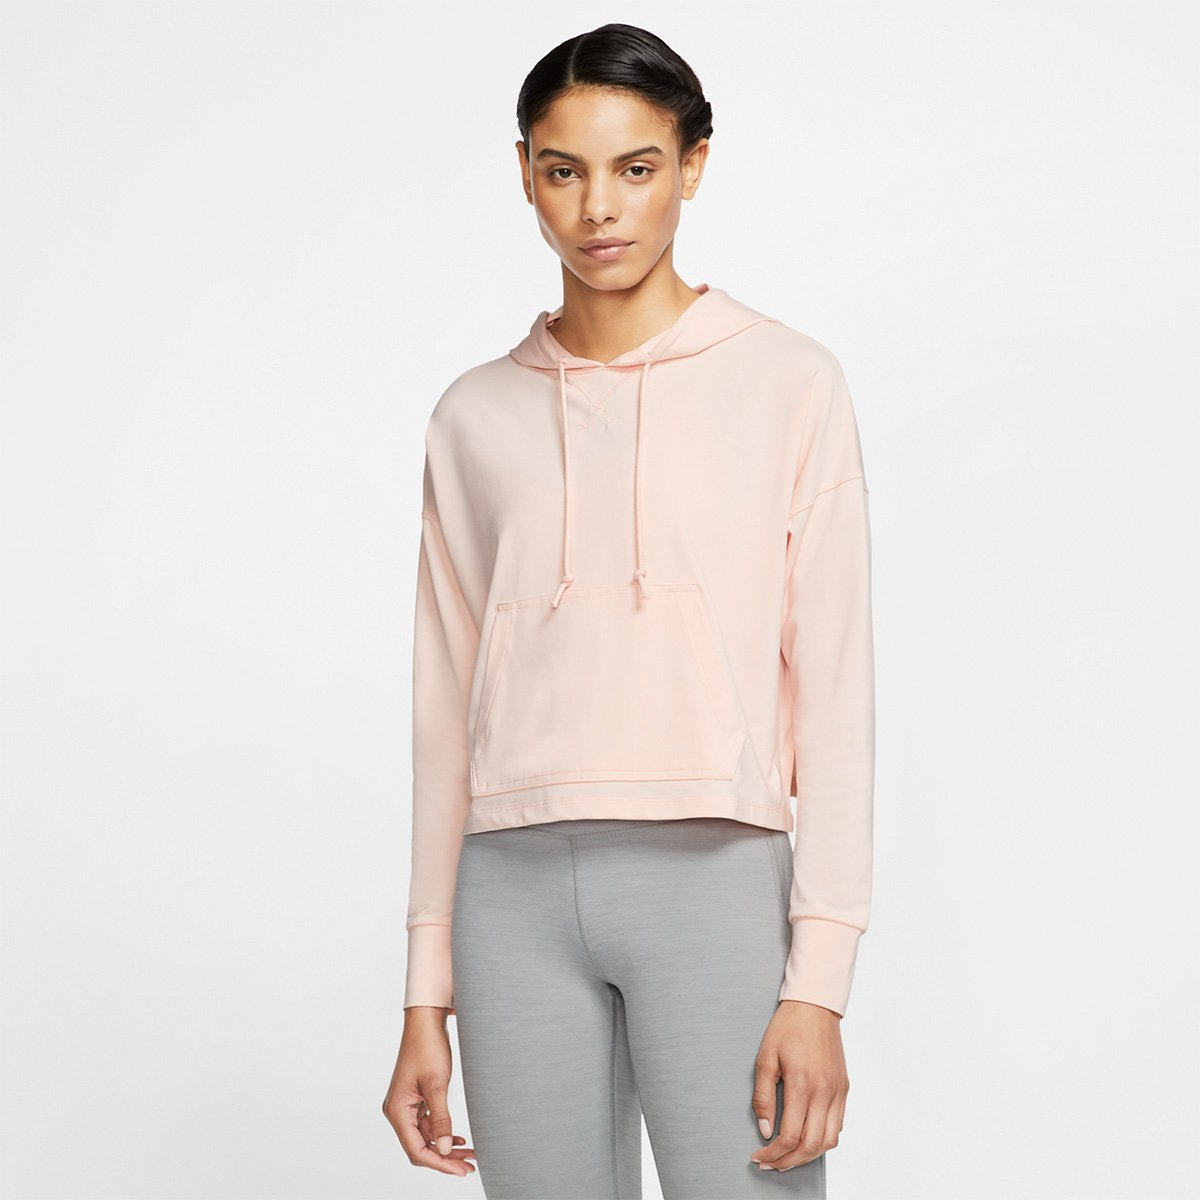 Moletom Nike Yoga Jersey Crop Capuz Feminino